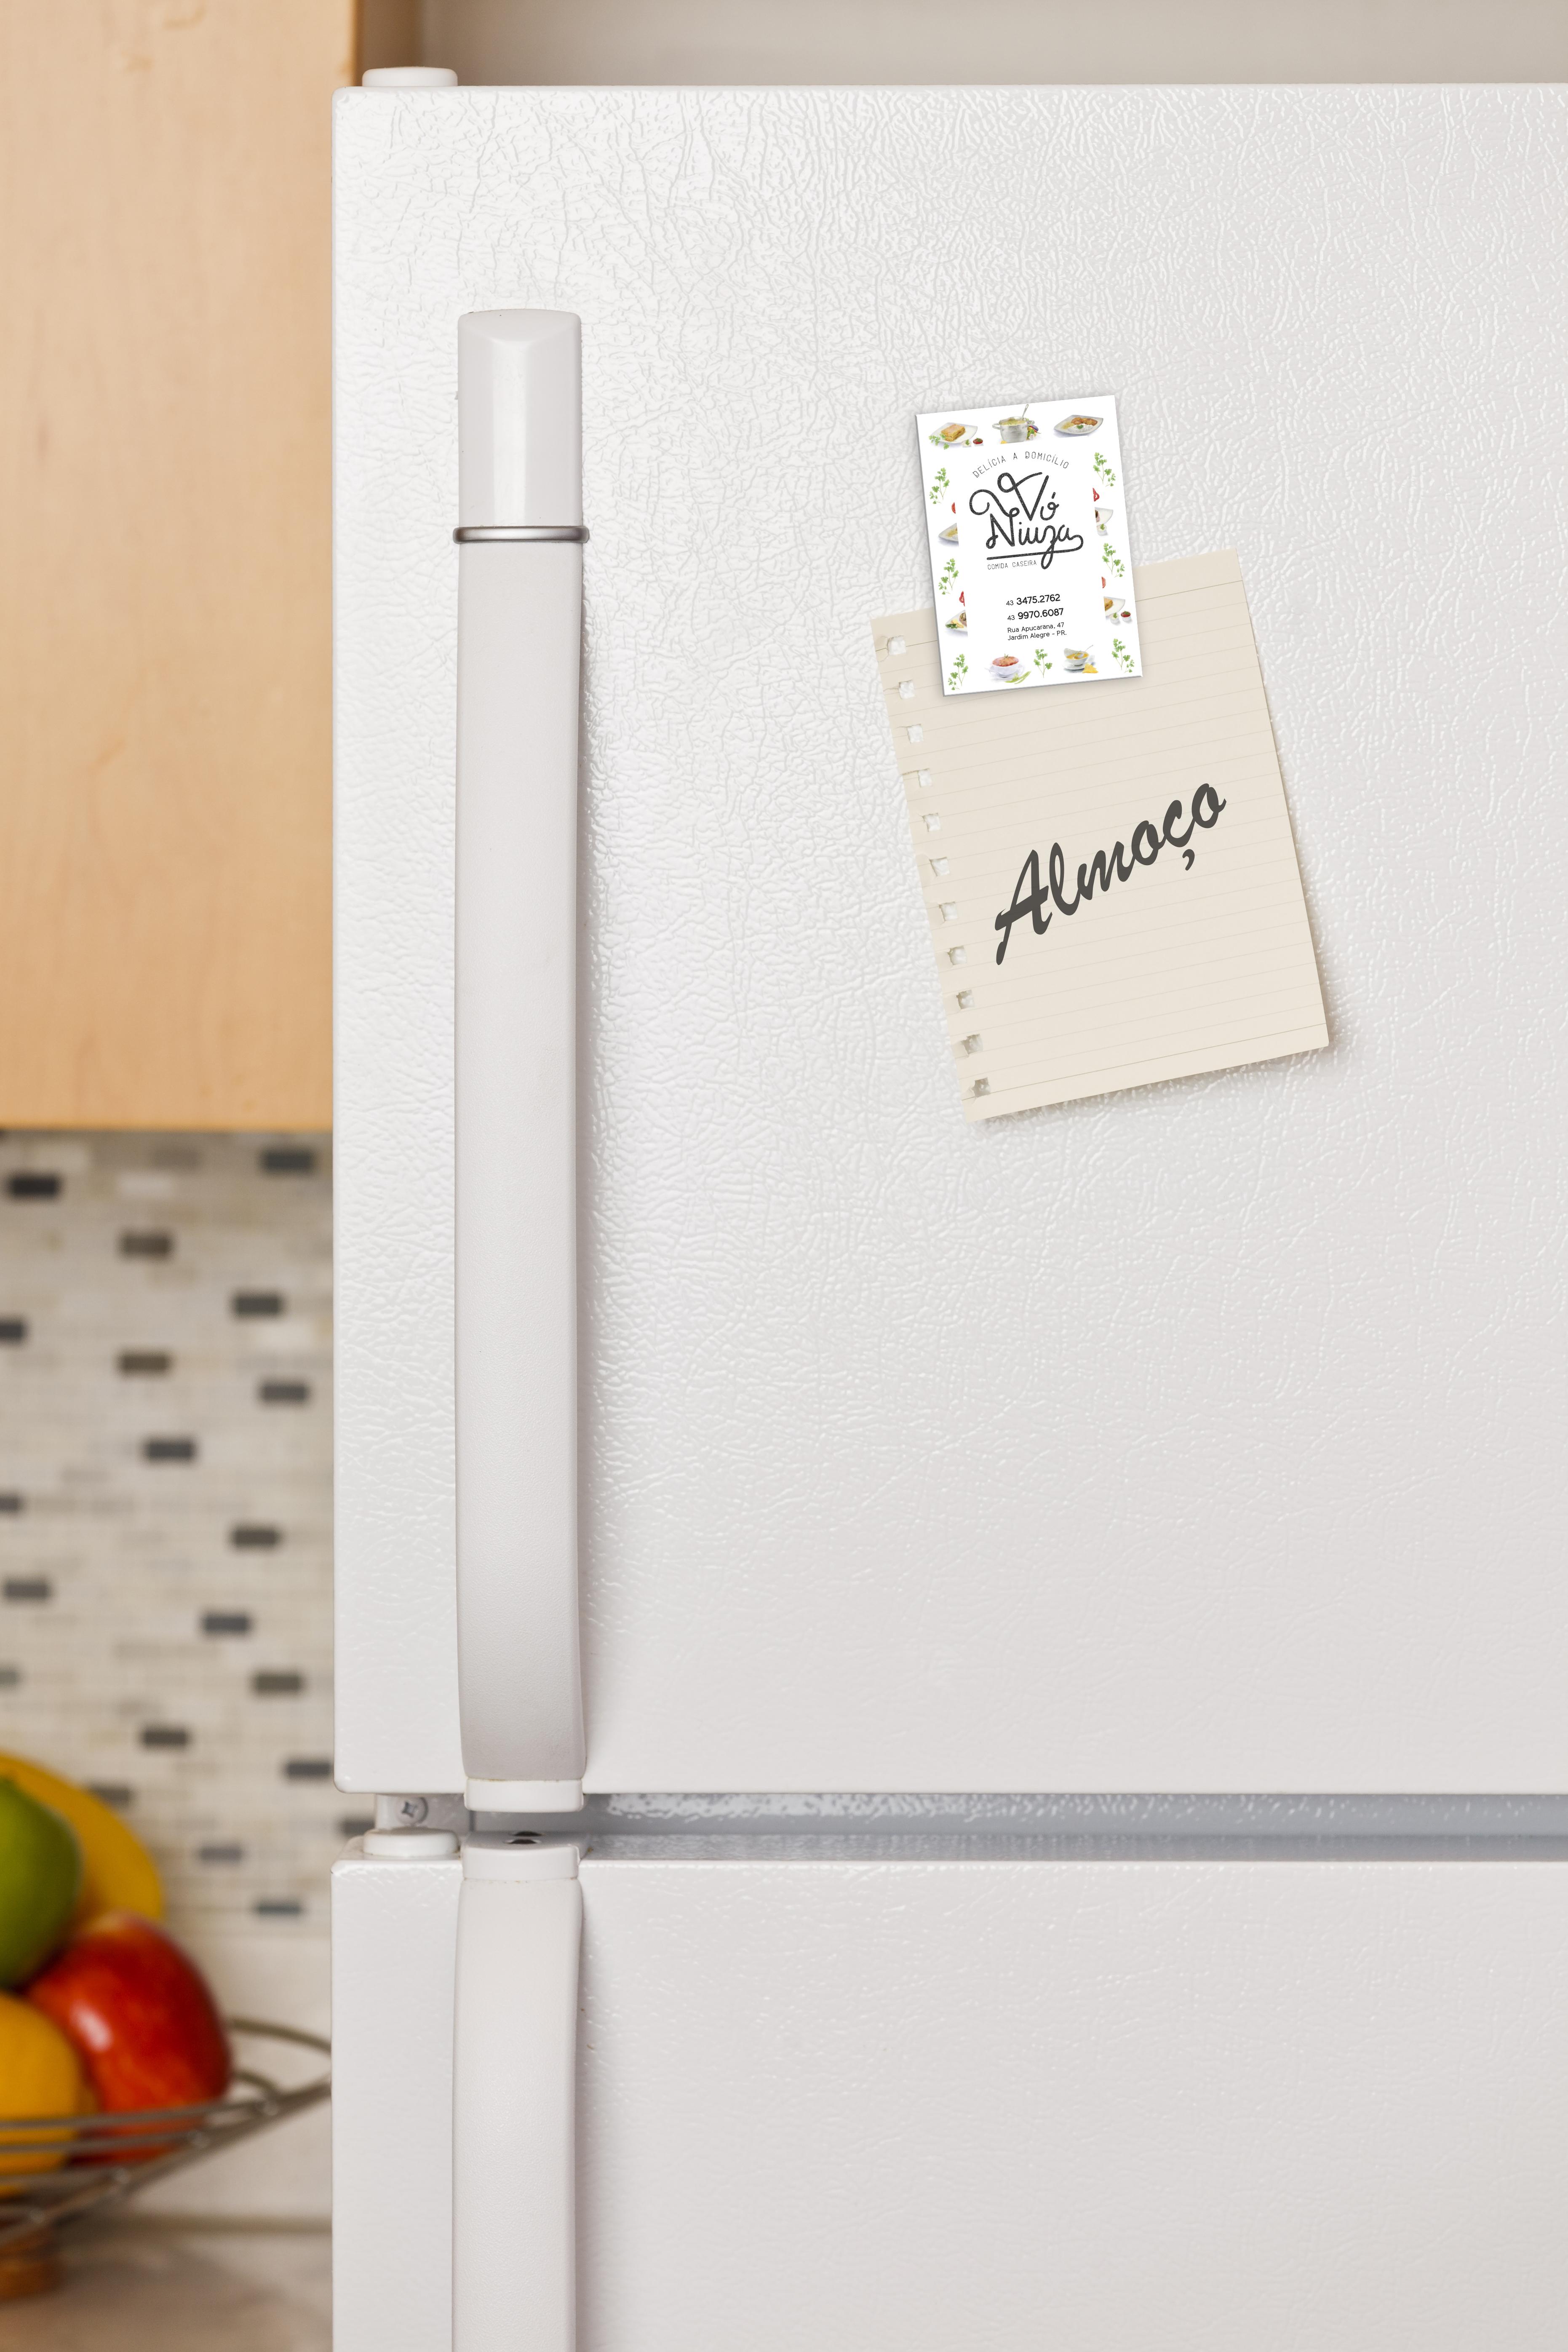 Inteligencia Marketing - VÓ NIUZA – NOVA IDENTIDADE - Note on refrigerator door